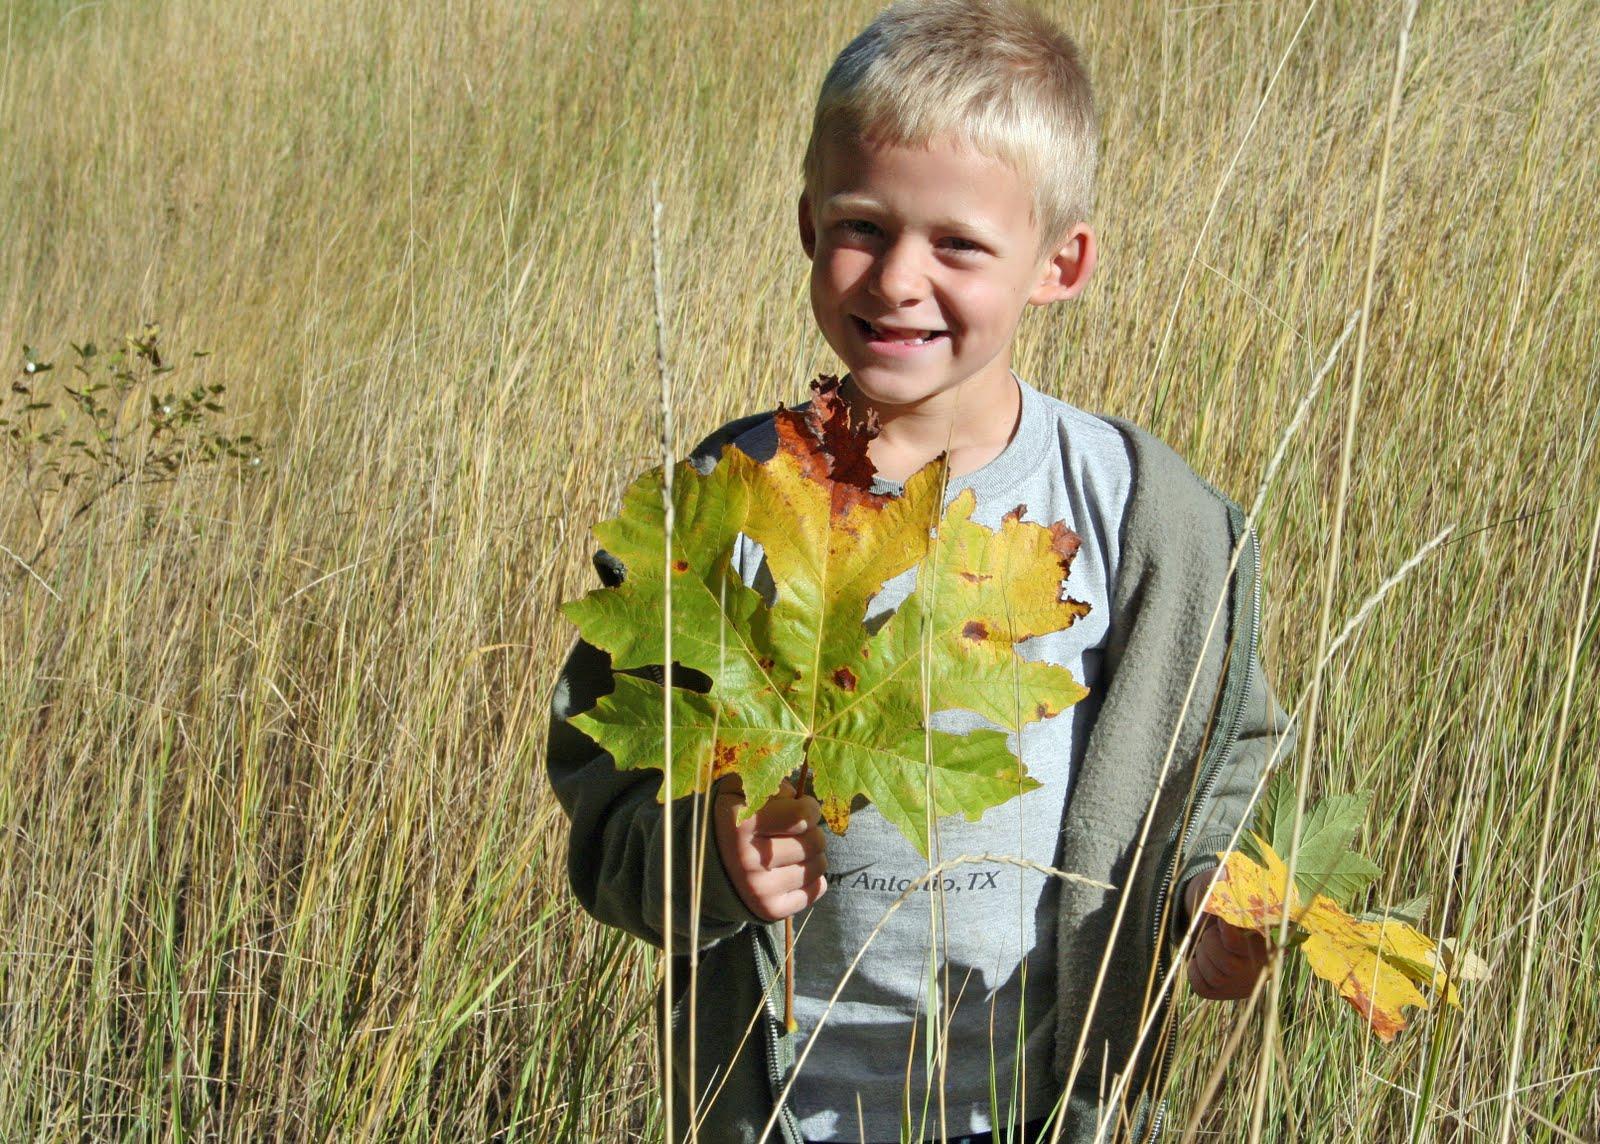 http://2.bp.blogspot.com/_XxFM-qXeOeQ/TLu_HAr09TI/AAAAAAAABfY/dnHxkPFsUU8/s1600/gabe+in+grass+with+leaf.jpg